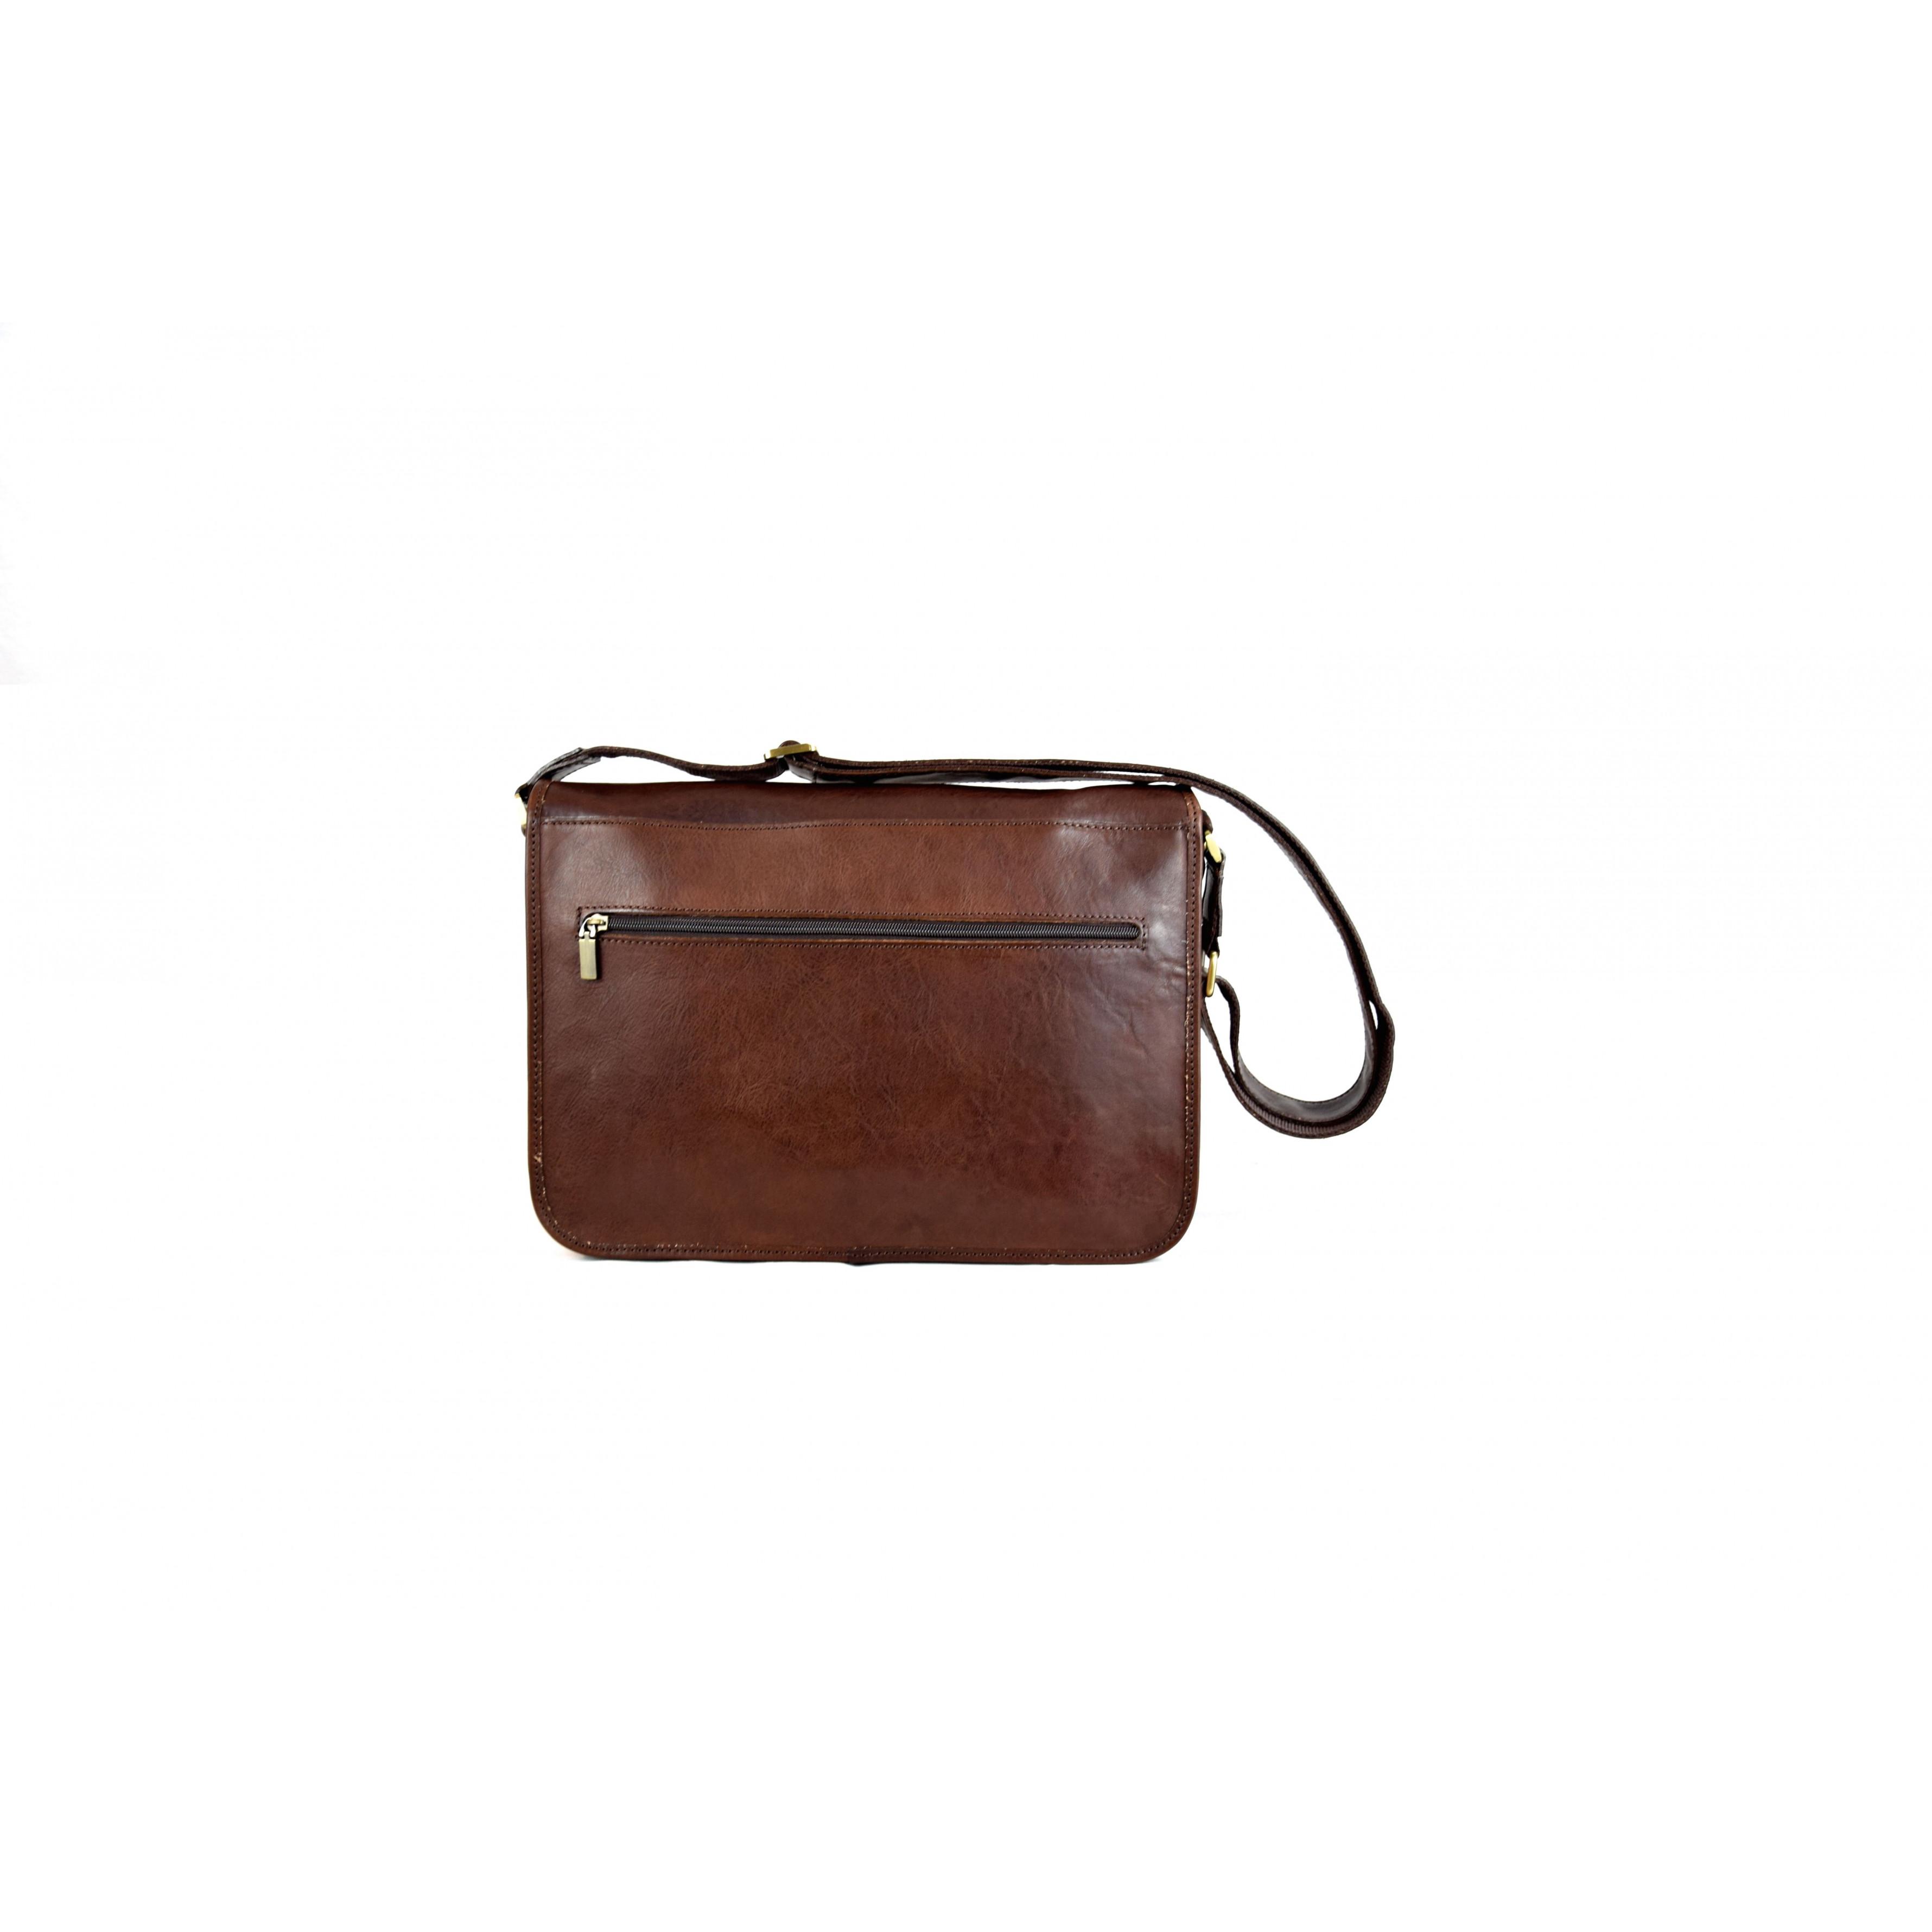 Leather Bag | Unisex Crossbody Briefcase